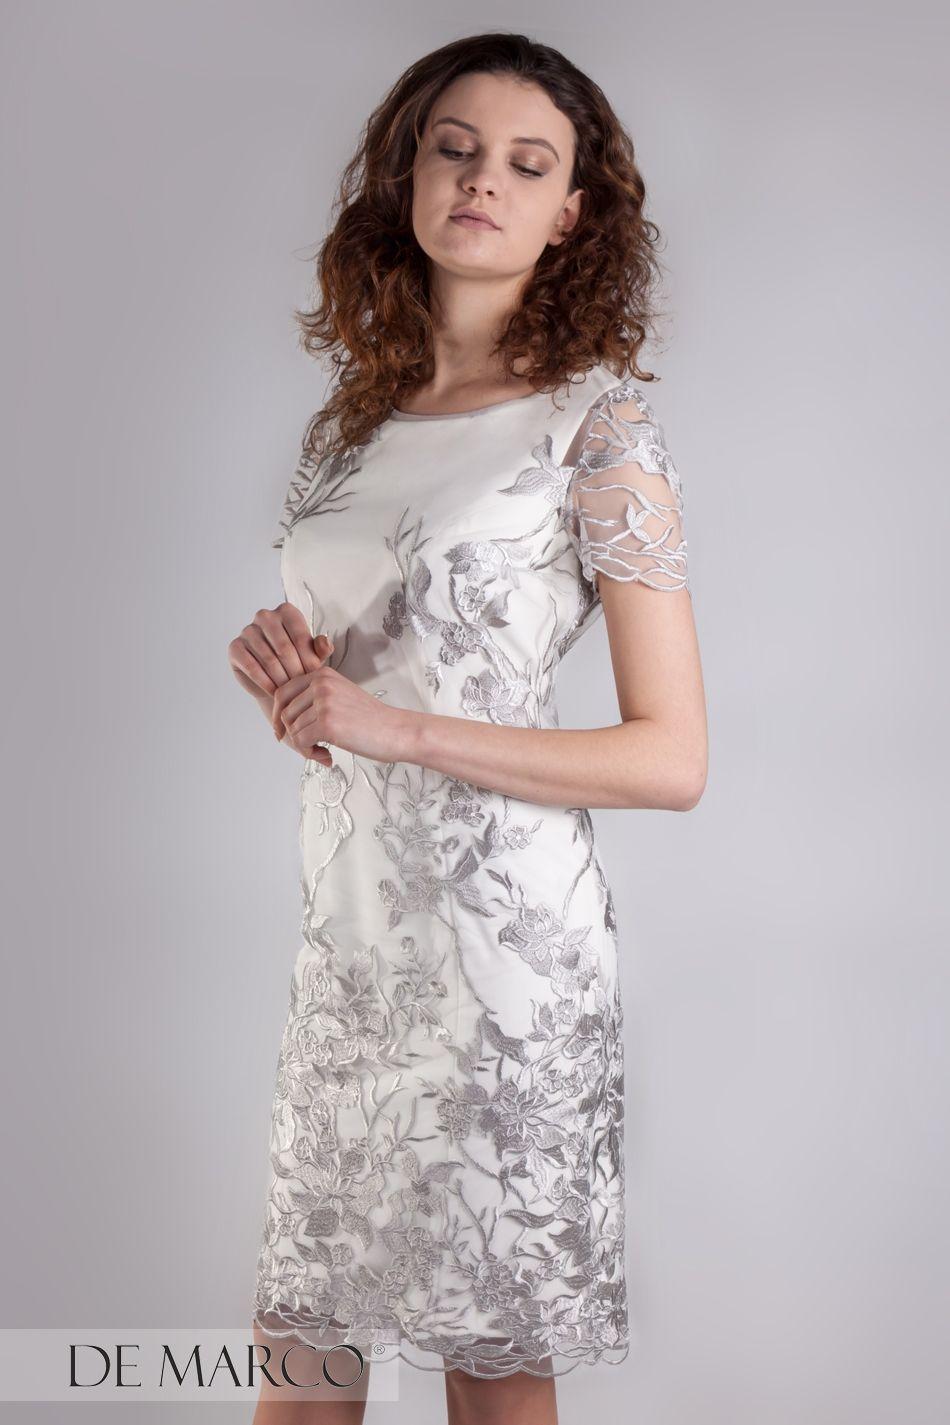 Komplety Na Wesele Komunie Wizyte Delegacje Sukna I Zakiet White Dress Cocktail Dress Formal Dresses